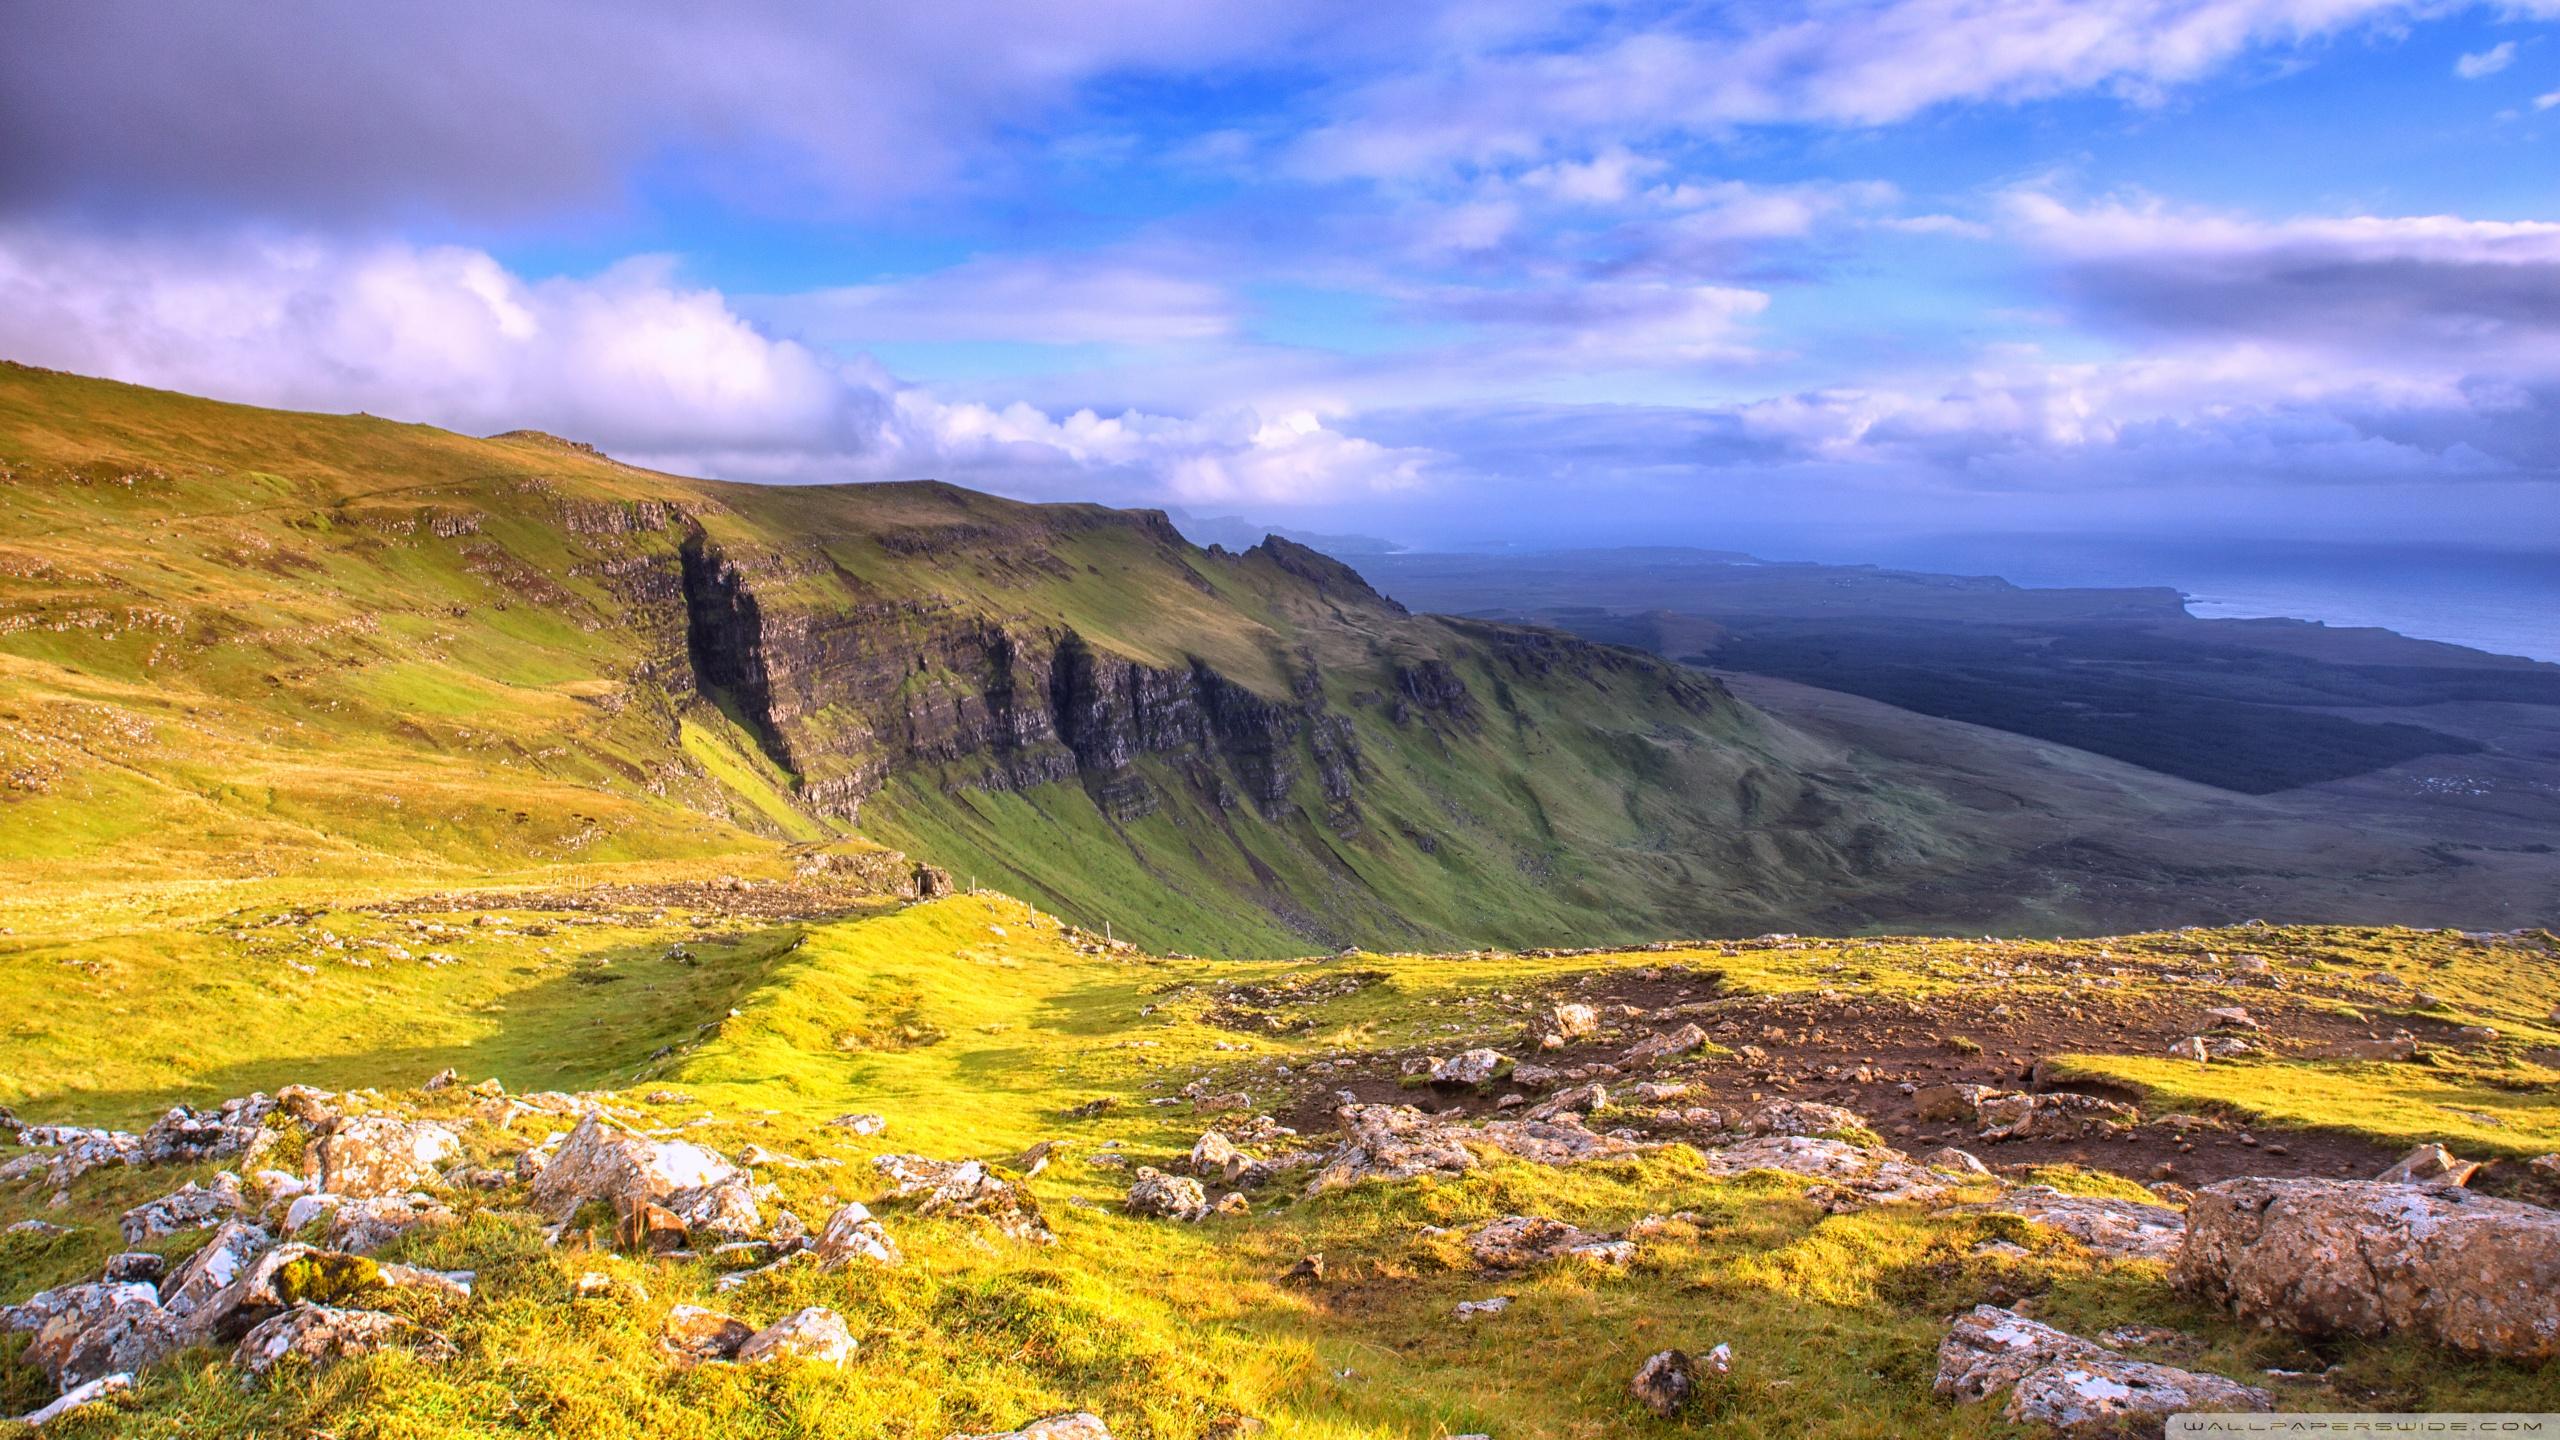 2560x1080 Fall Mountain Wallpaper Isle Of Skye Panoramic View 4k Hd Desktop Wallpaper For